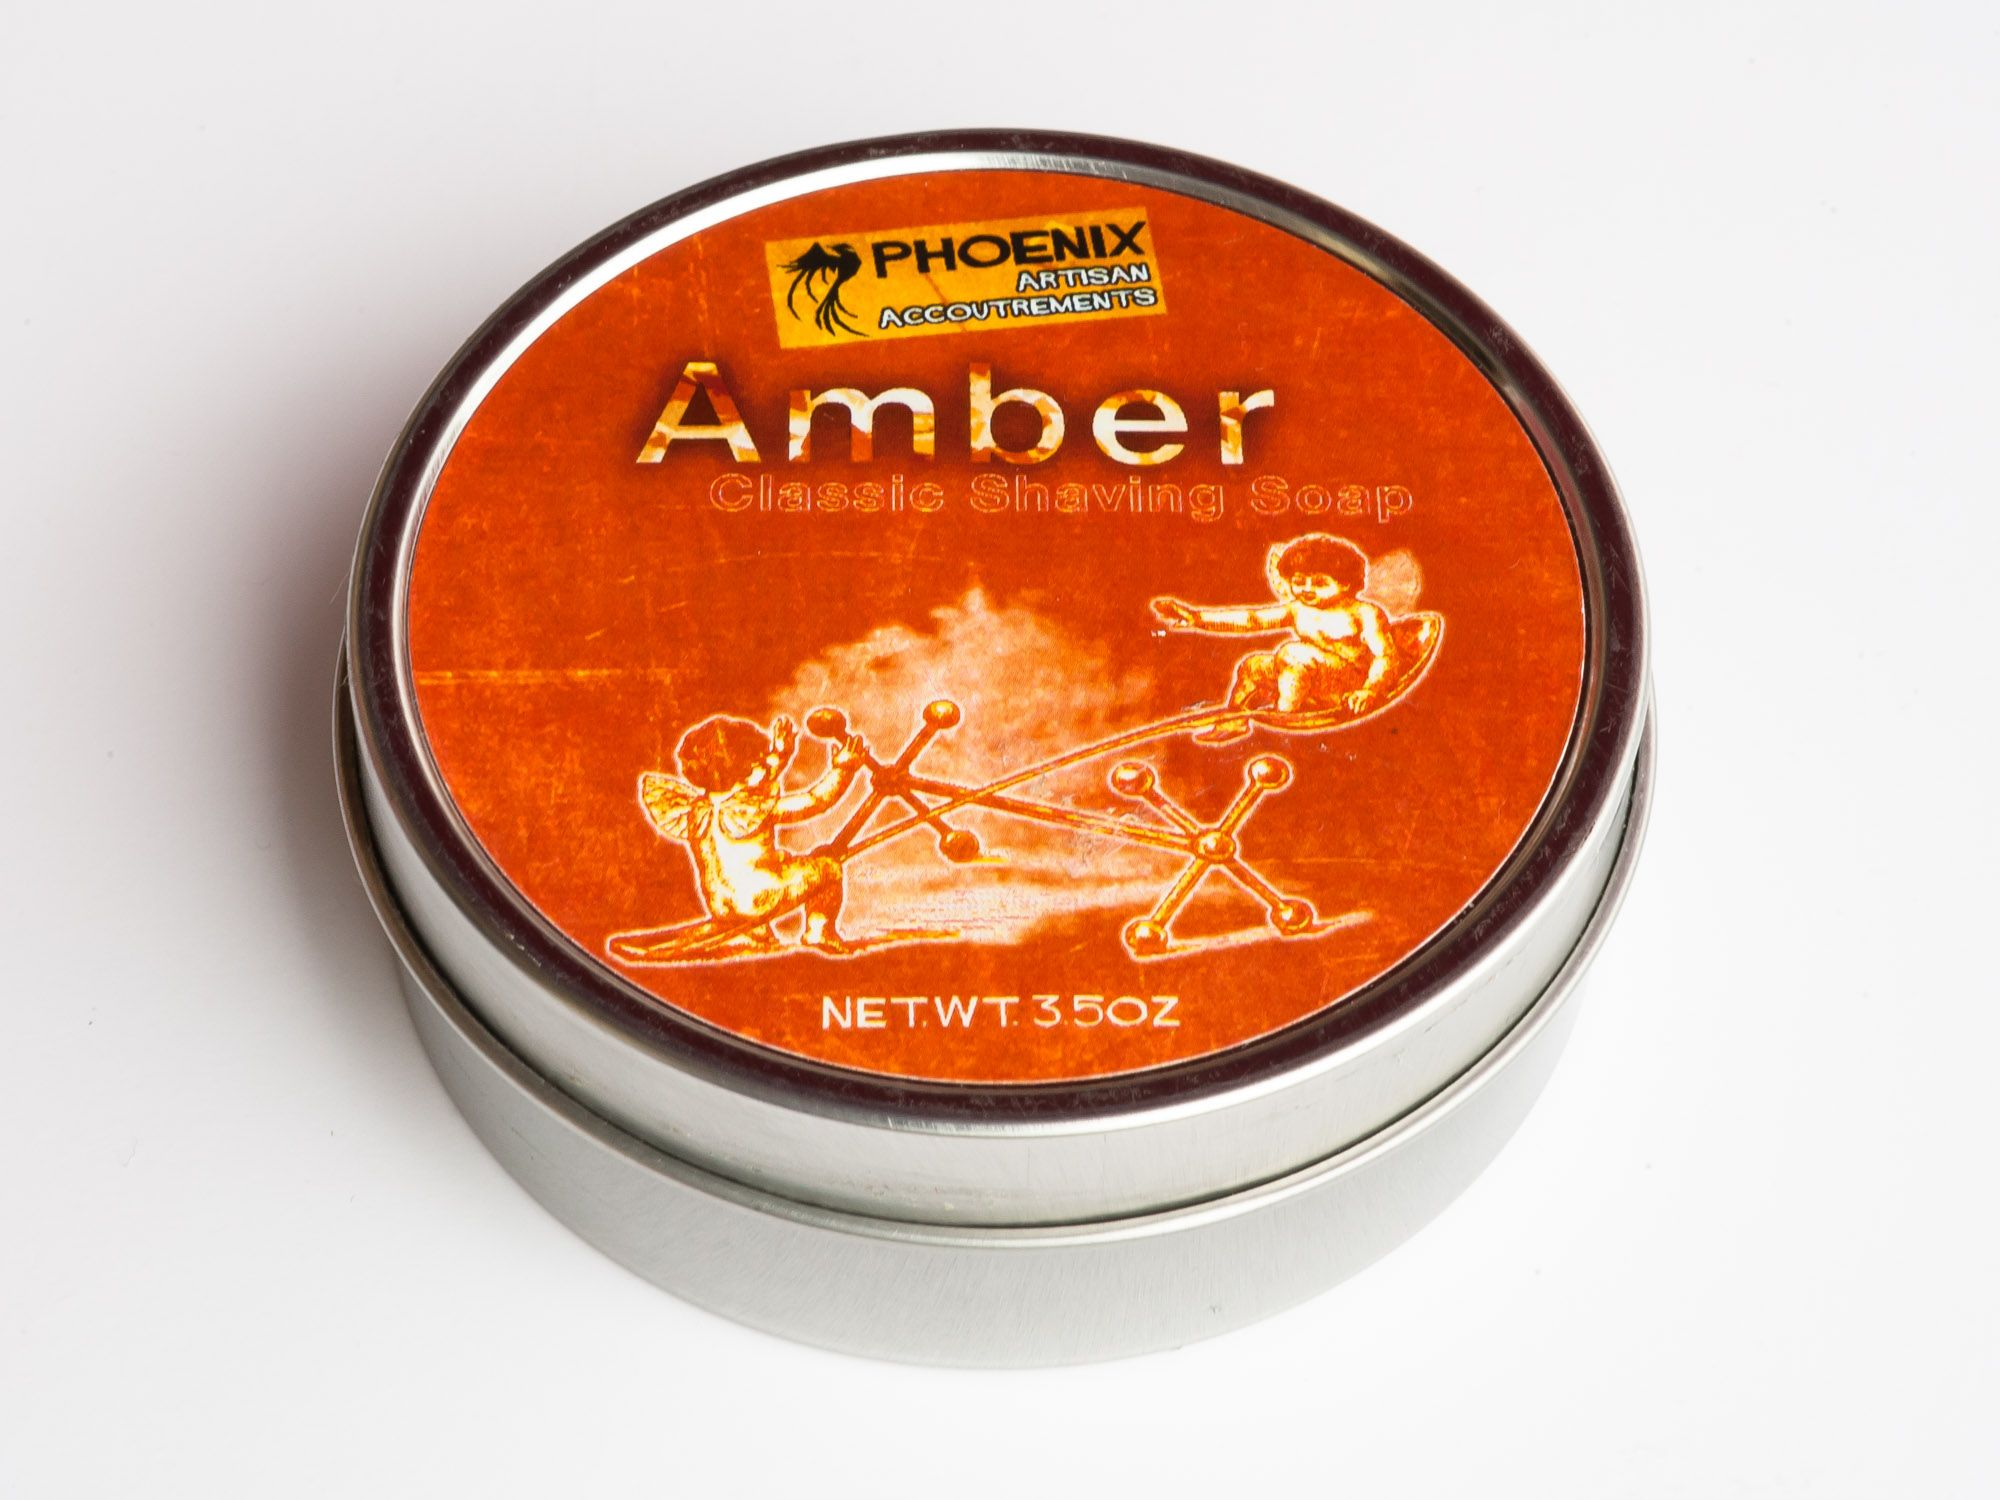 Puszka mydła do golenia Phoenix Artisan Accoutrements Amber Shaving Soap